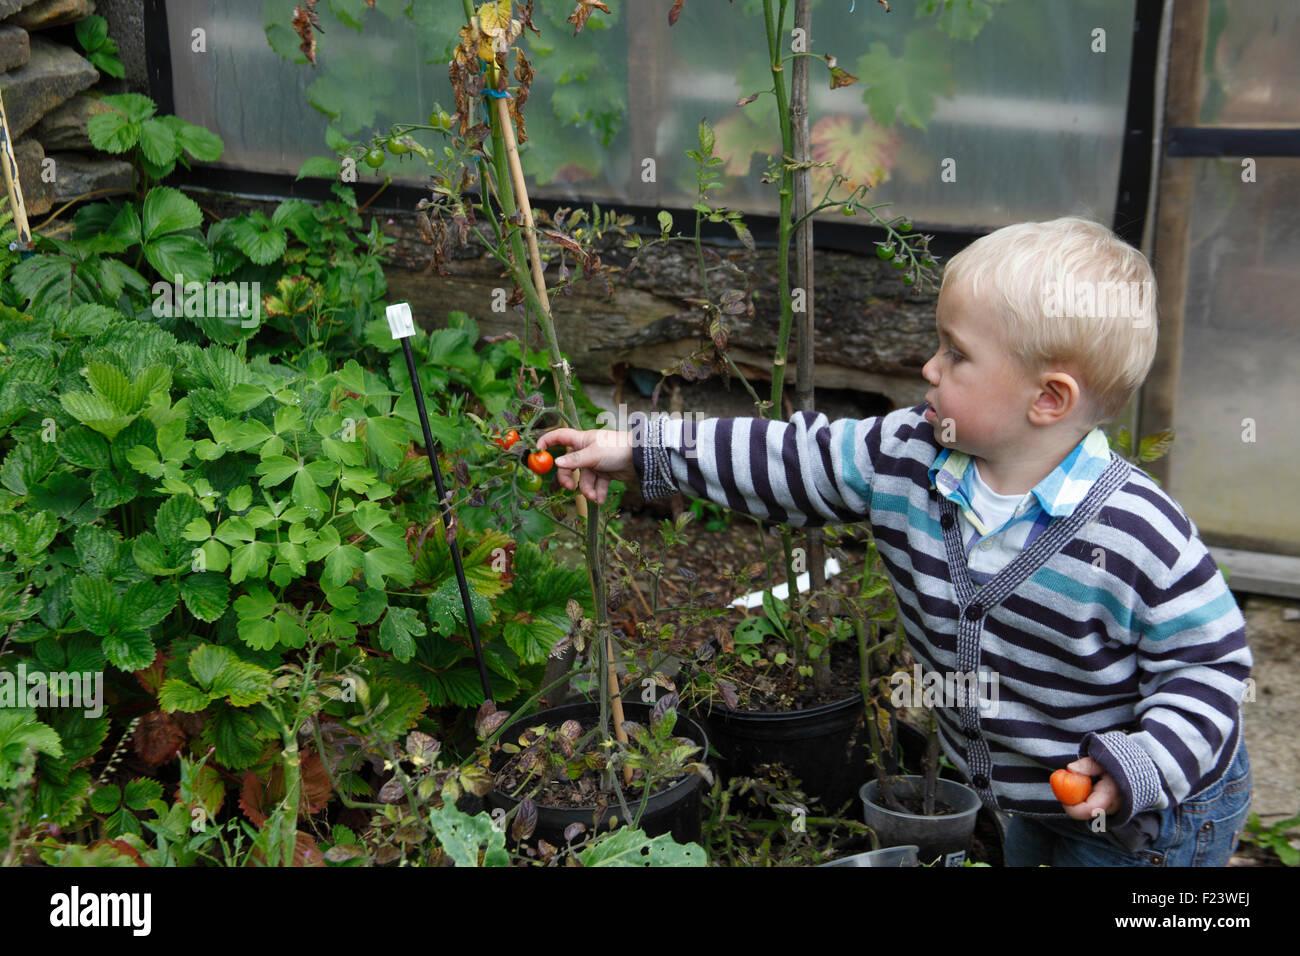 Toddler picking ripe cherry tomato growing outside - Stock Image